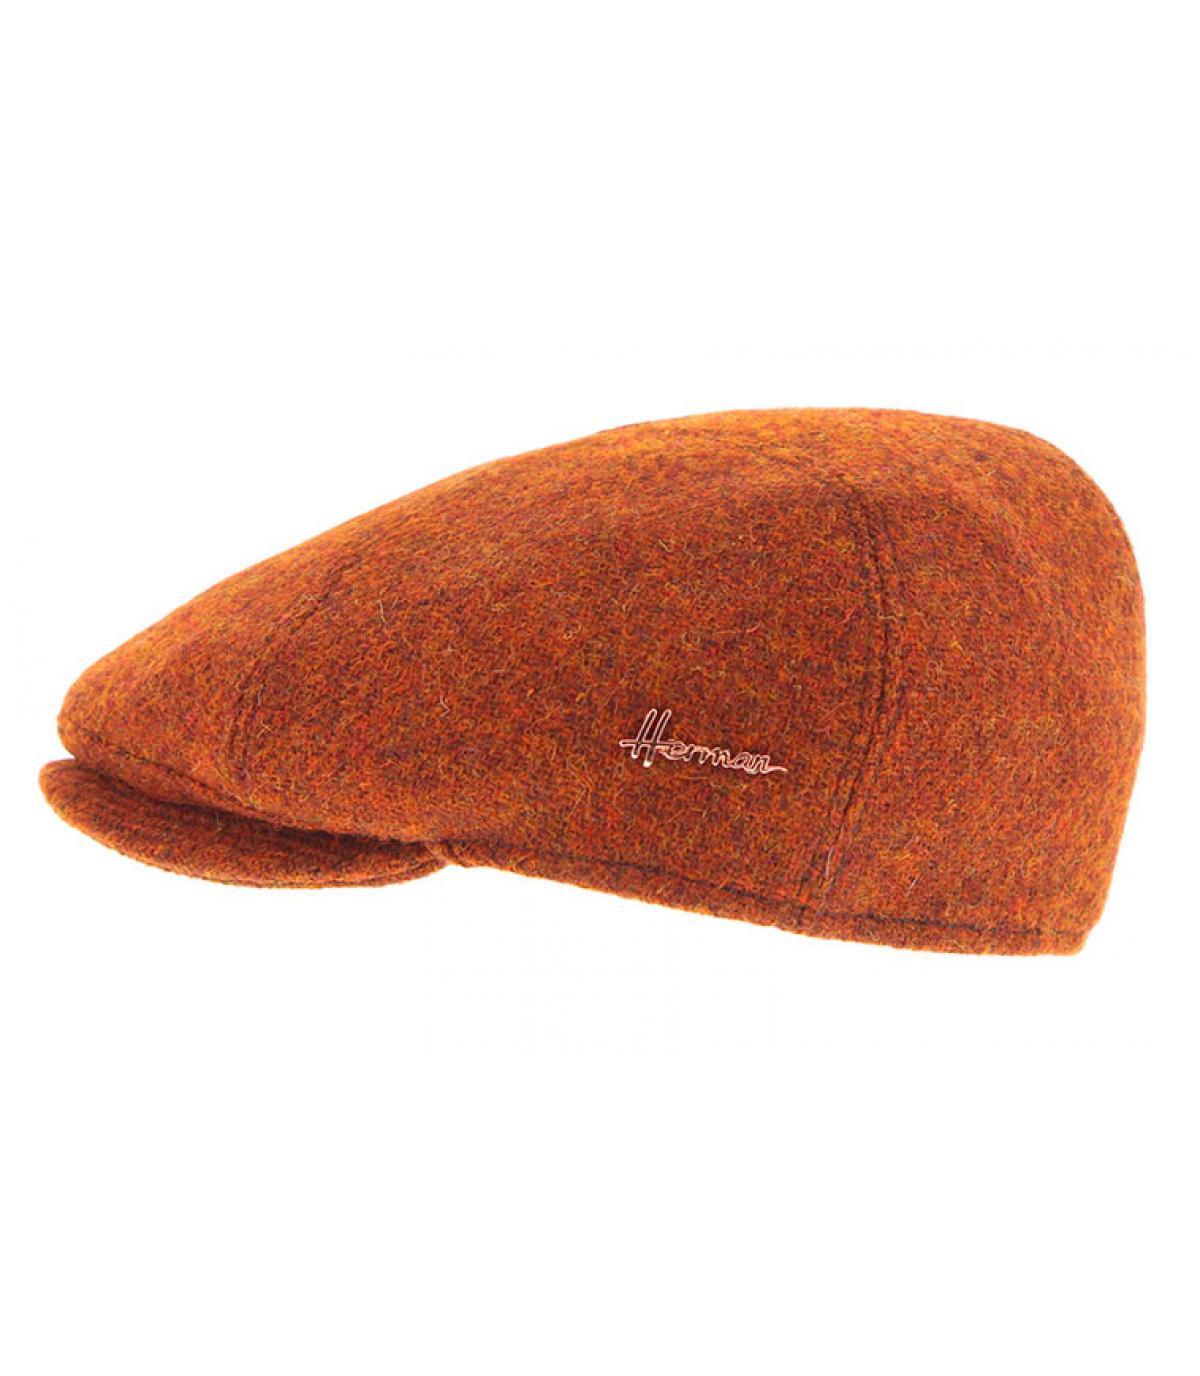 Détails Usurper Harris Tweed orange - image 2